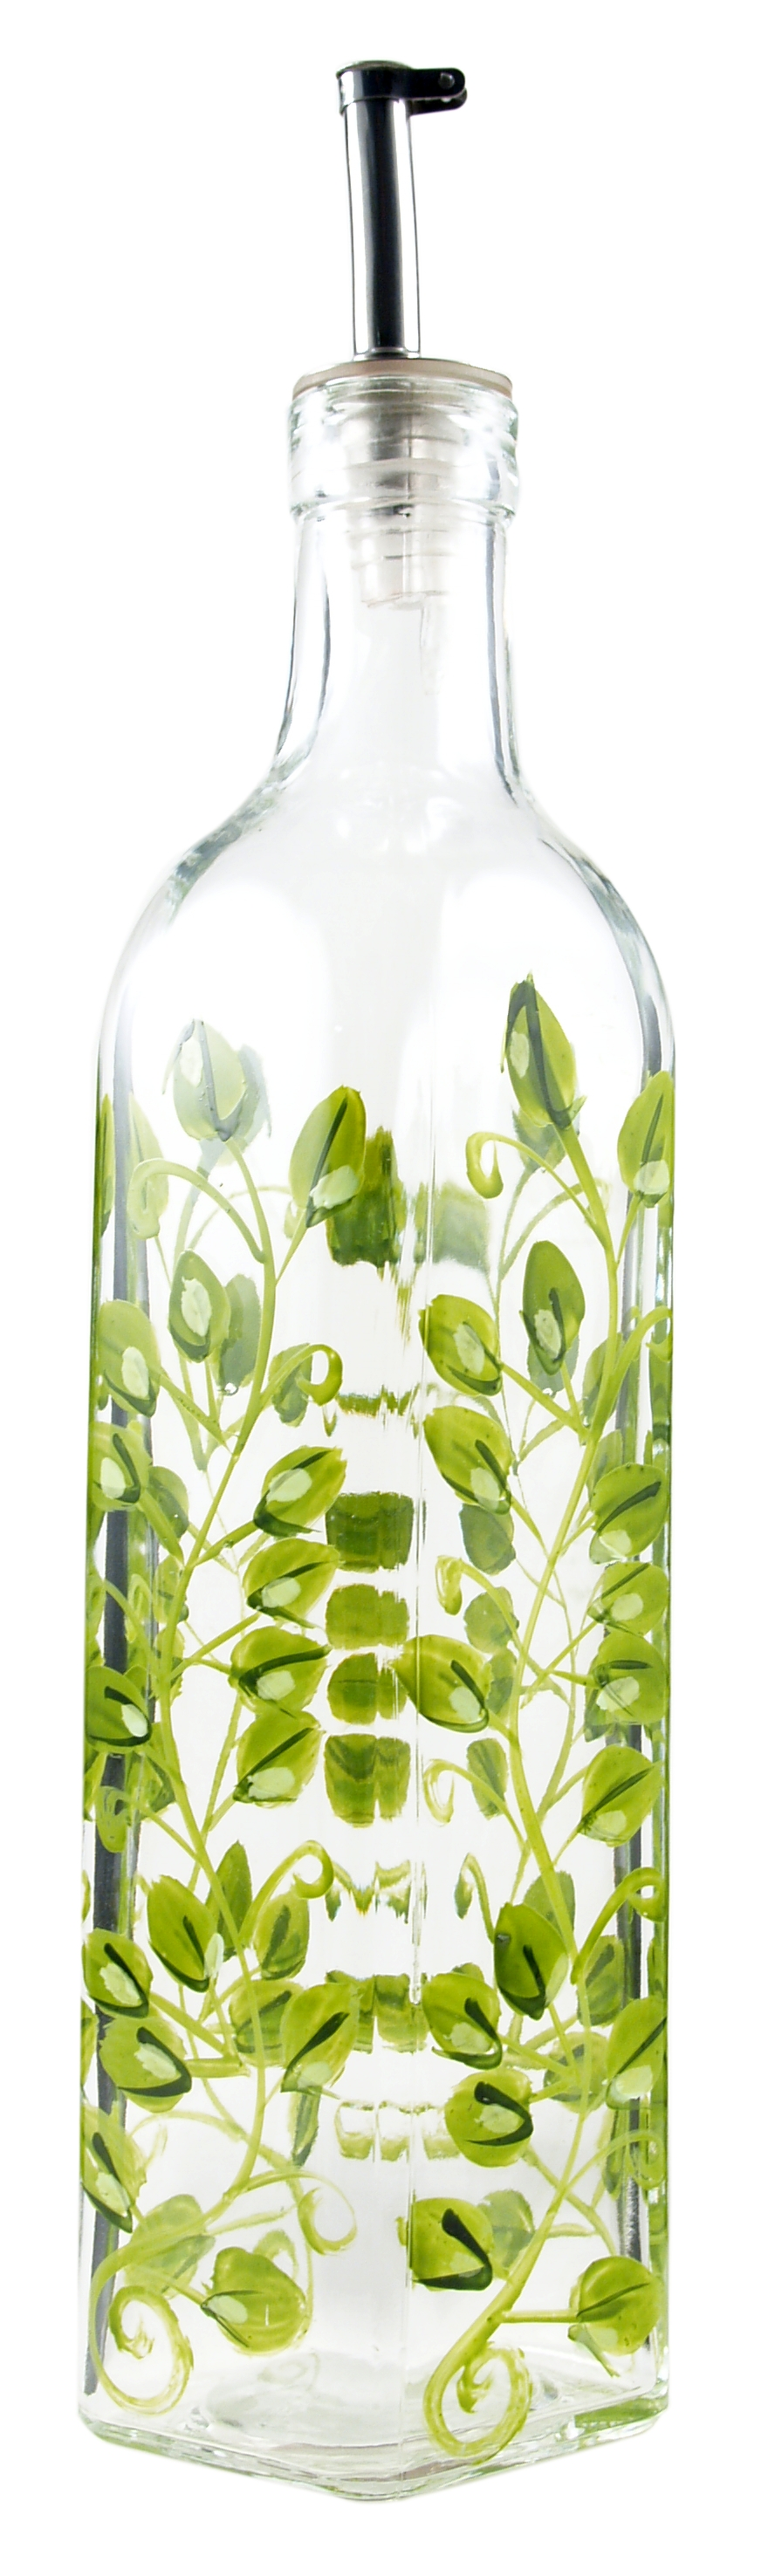 Grant Howard Vines Glass Cruet